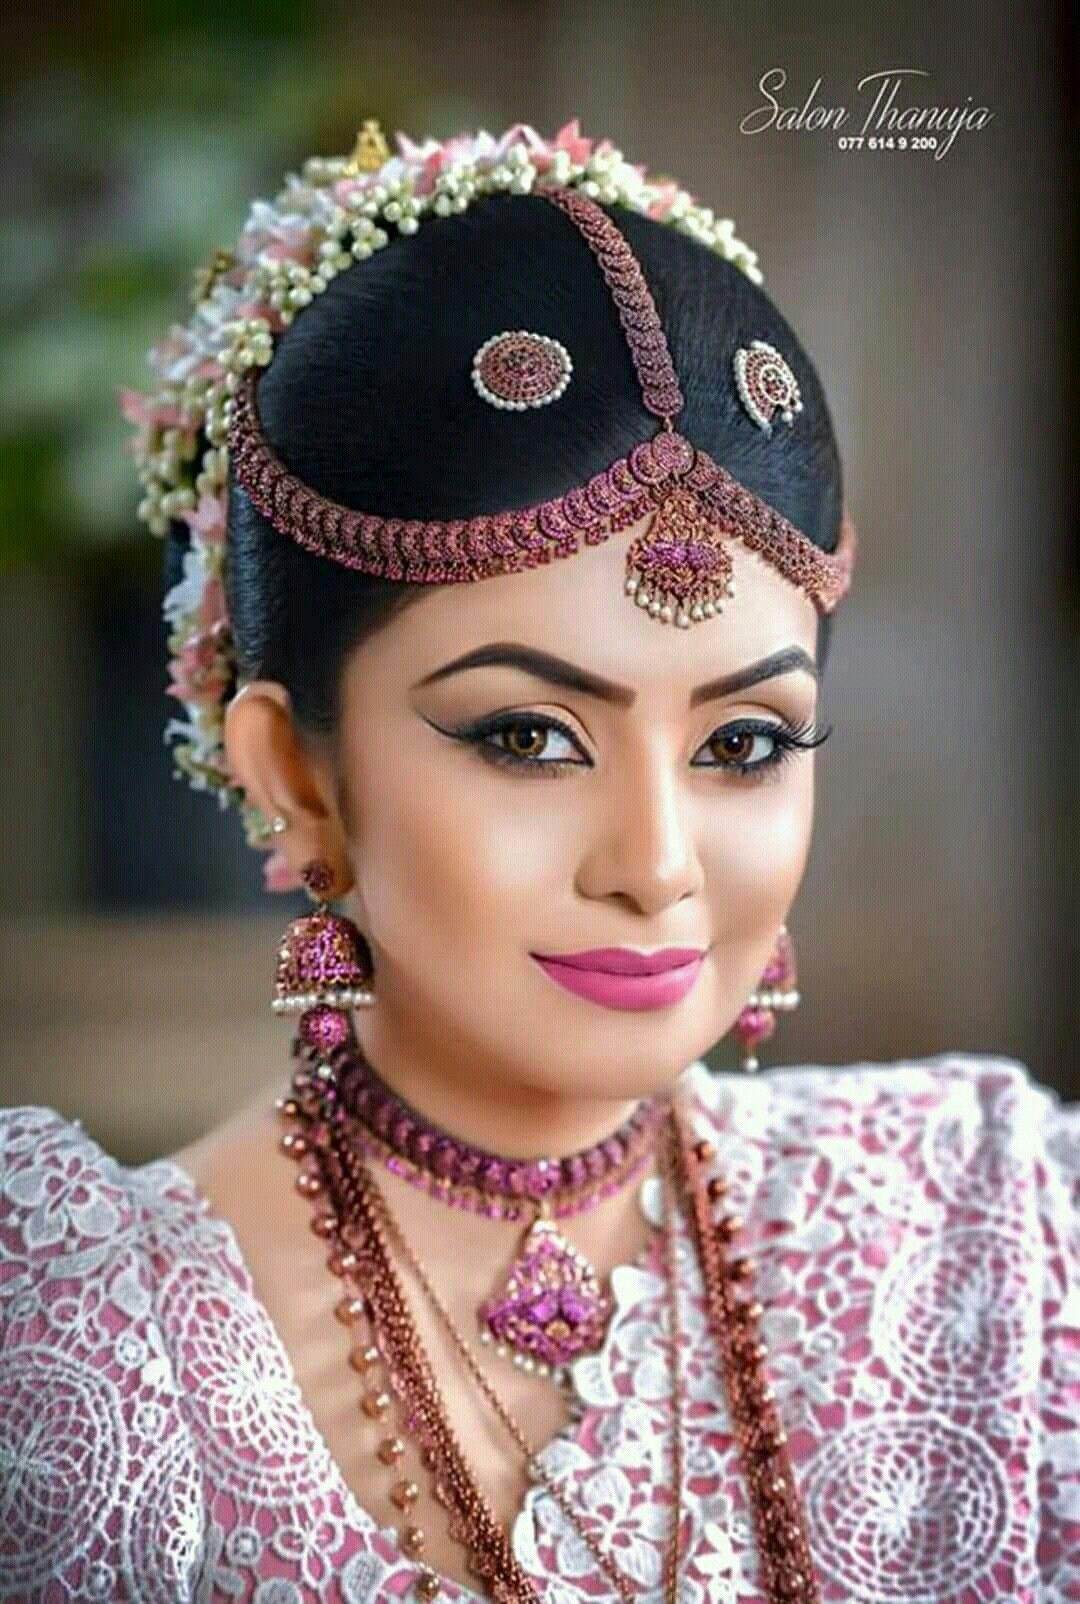 Thanuja Dananjaya White Saree Wedding